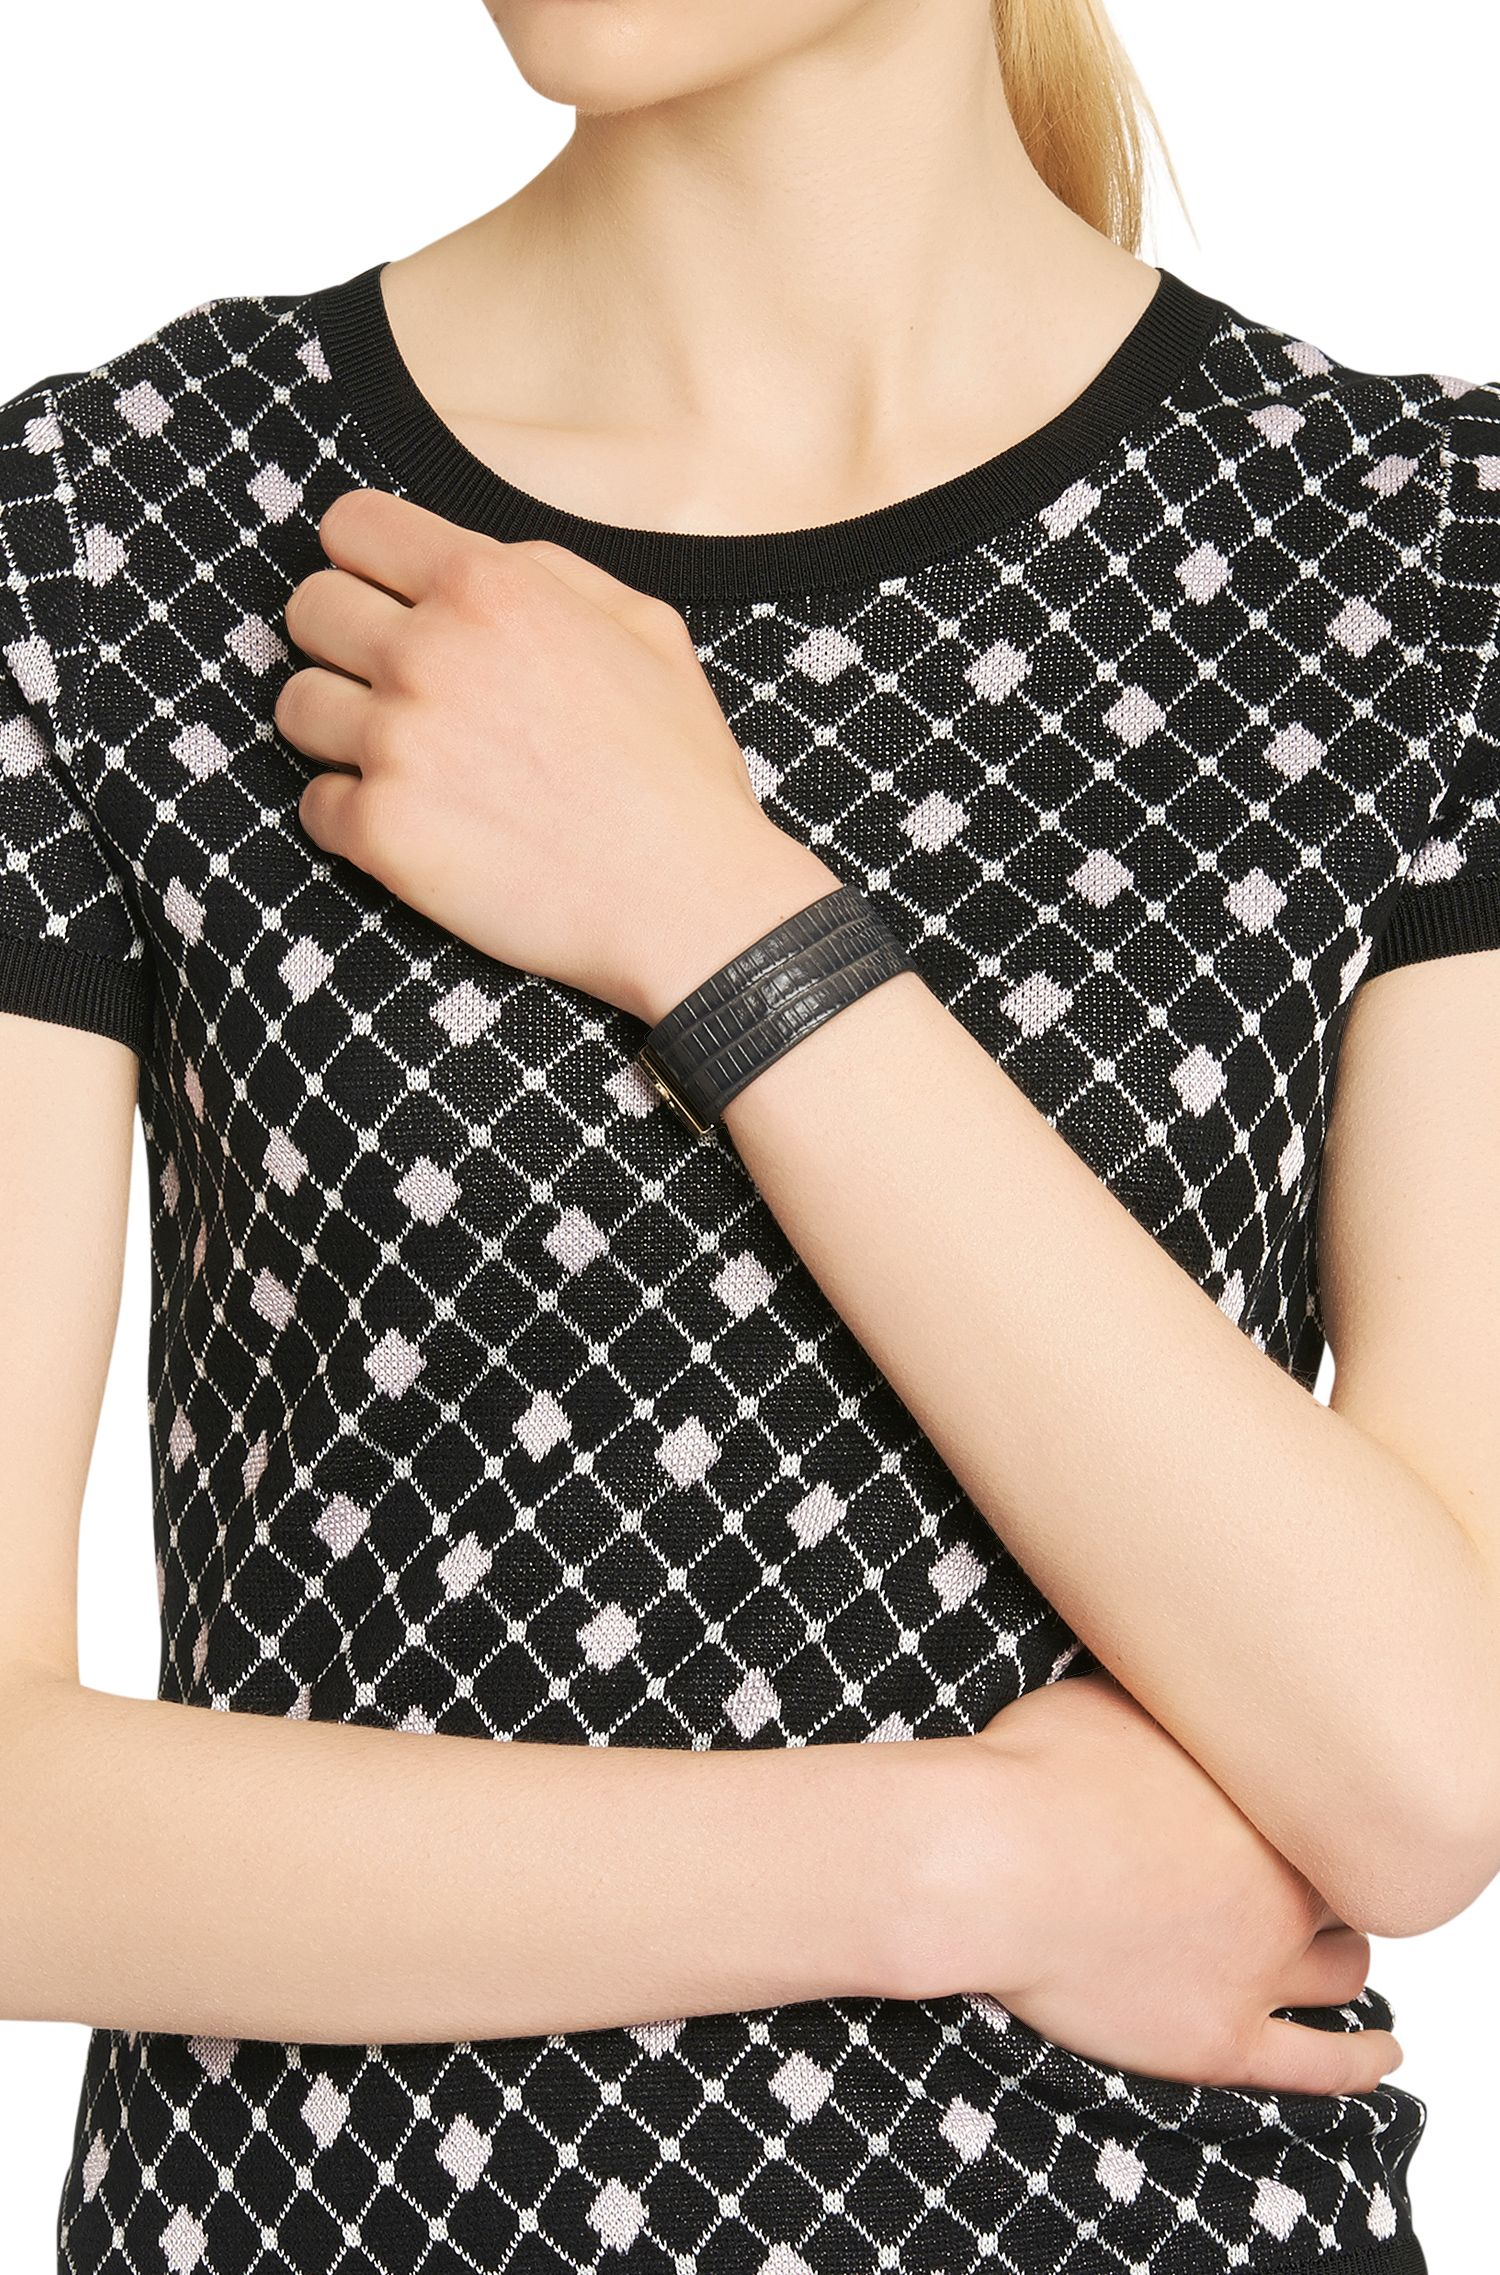 Armband aus Leder mit Eidechsen-Print: 'Grace Bracelet-LA'